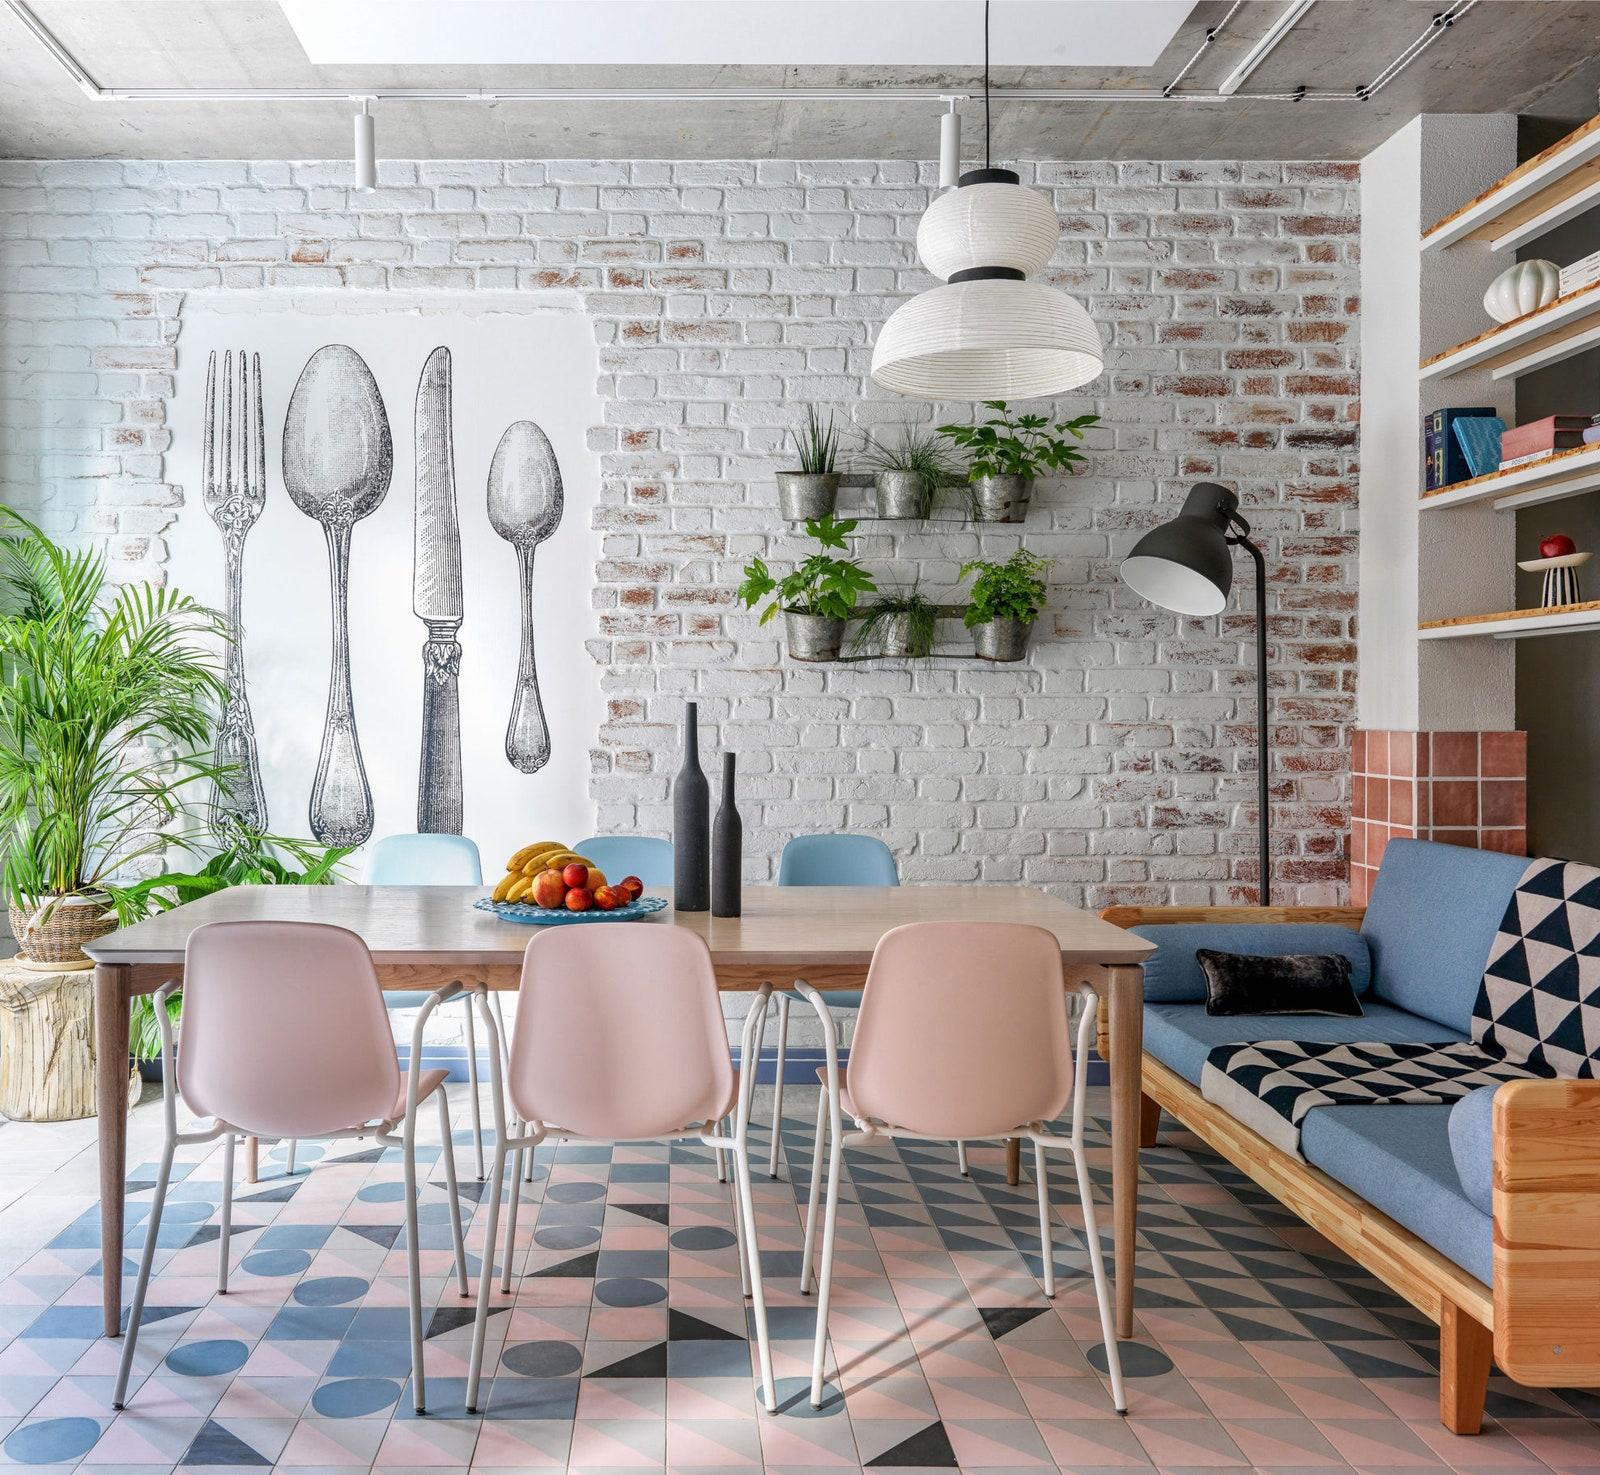 . .     IKEA  SK Design    Ceramum   Zara Home  Divan.ru  Formakami   Artefacto   Rebel Walls.   .